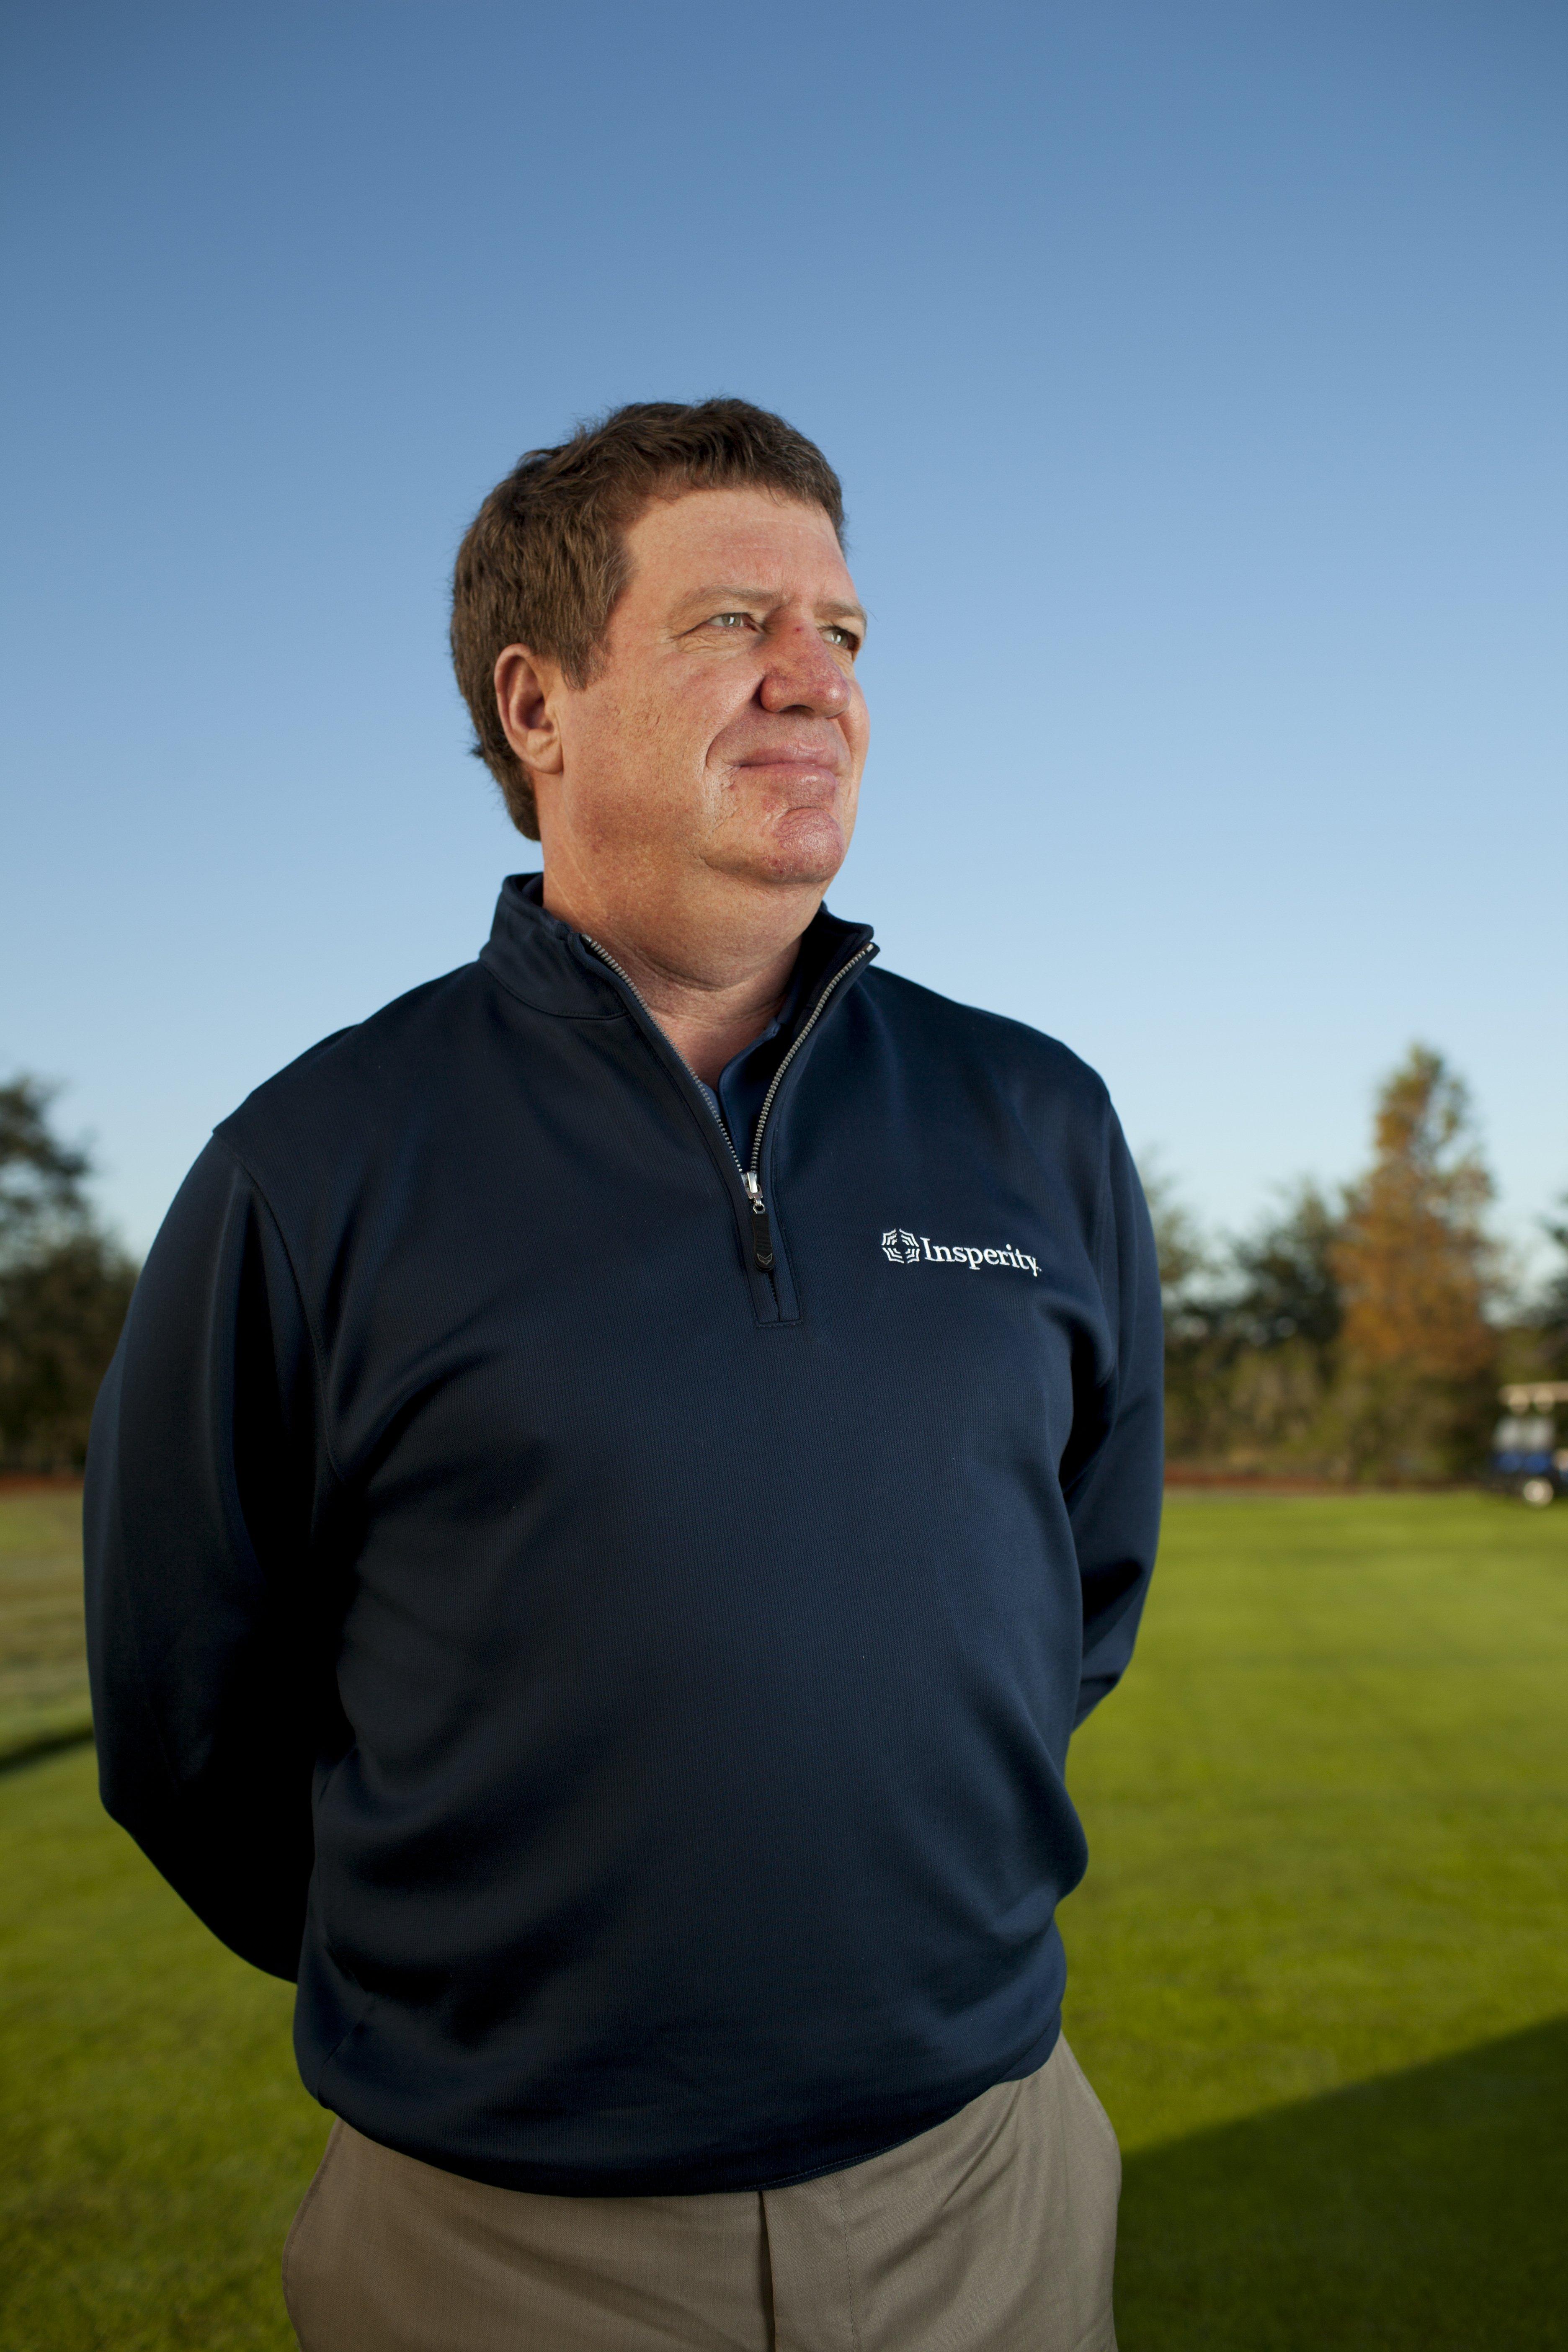 Elkington won 10 times on the PGA Tour, including the 1995 PGA Championship at Riviera.